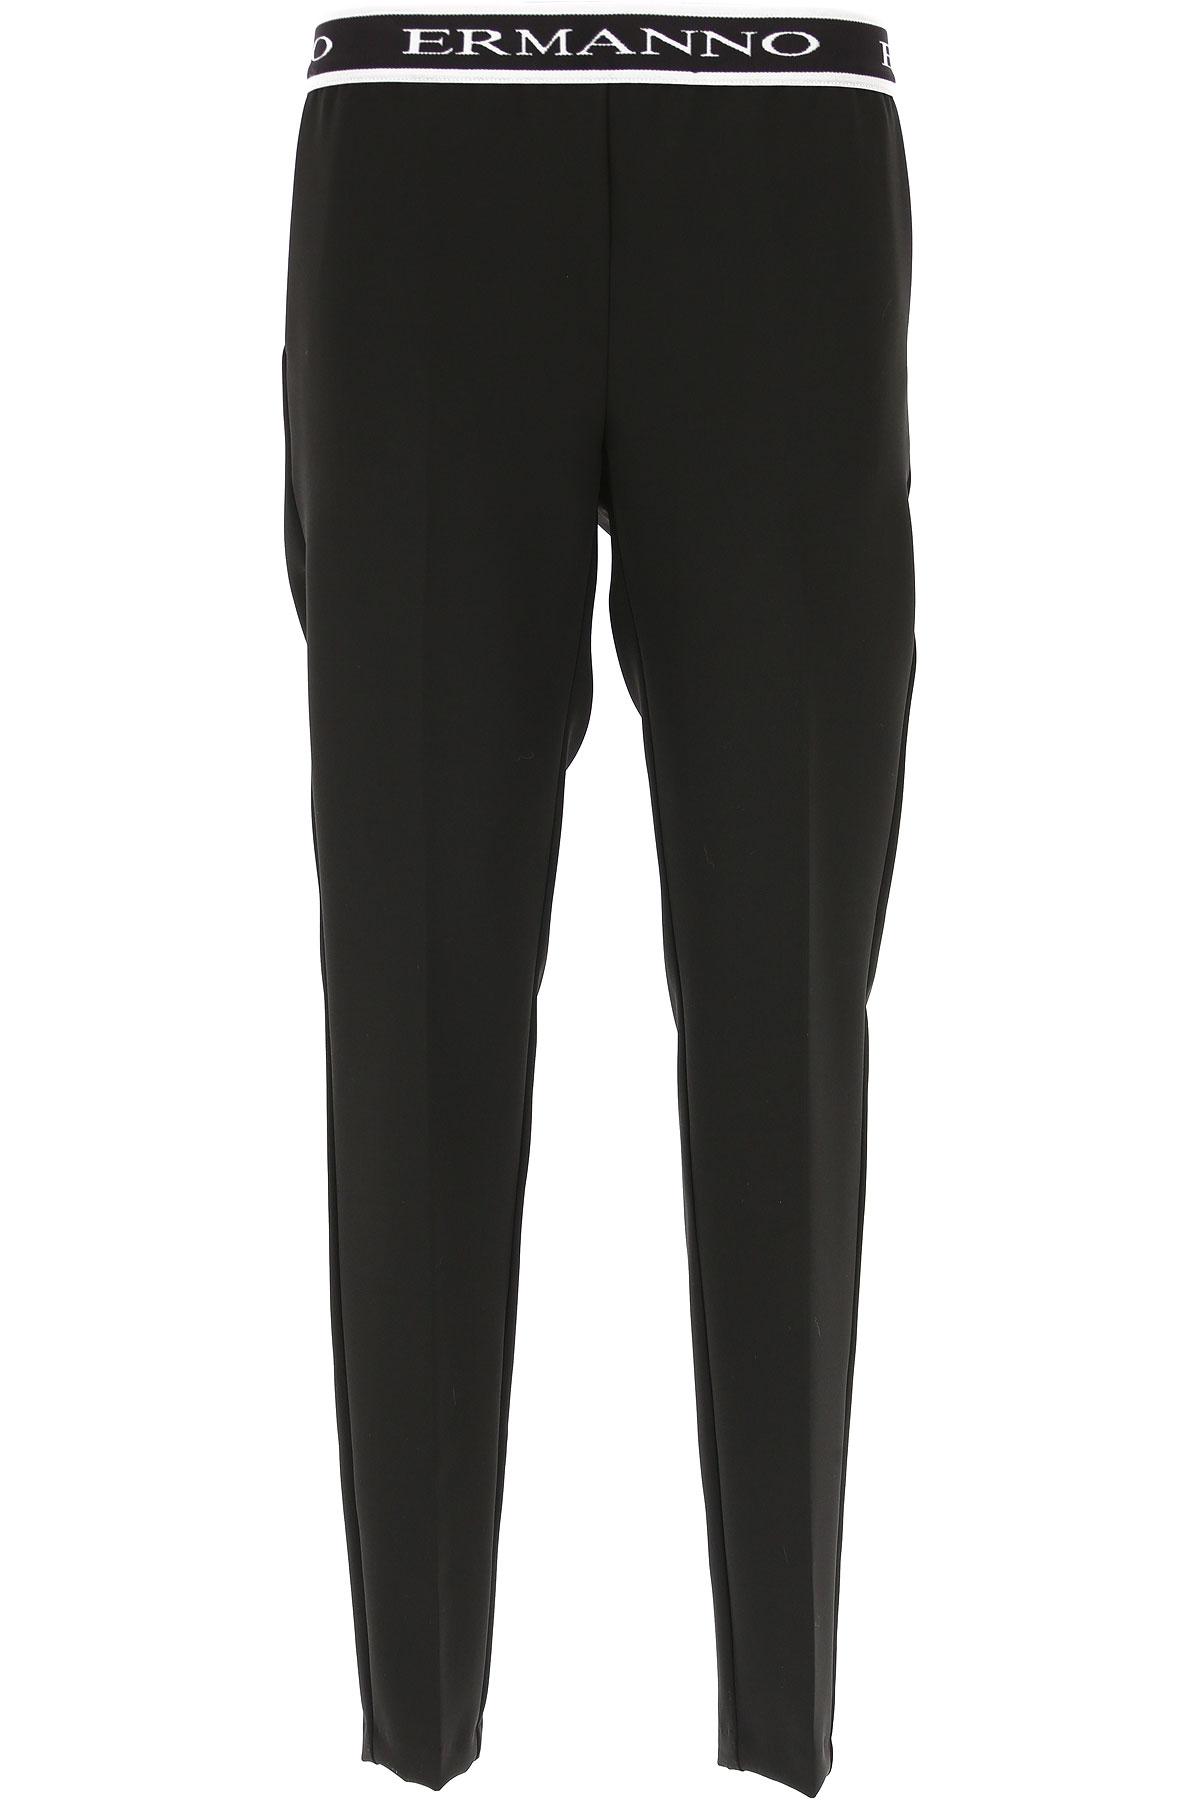 Image of Ermanno Scervino Pants for Women, Black, Elastane, 2017, 26 28 30